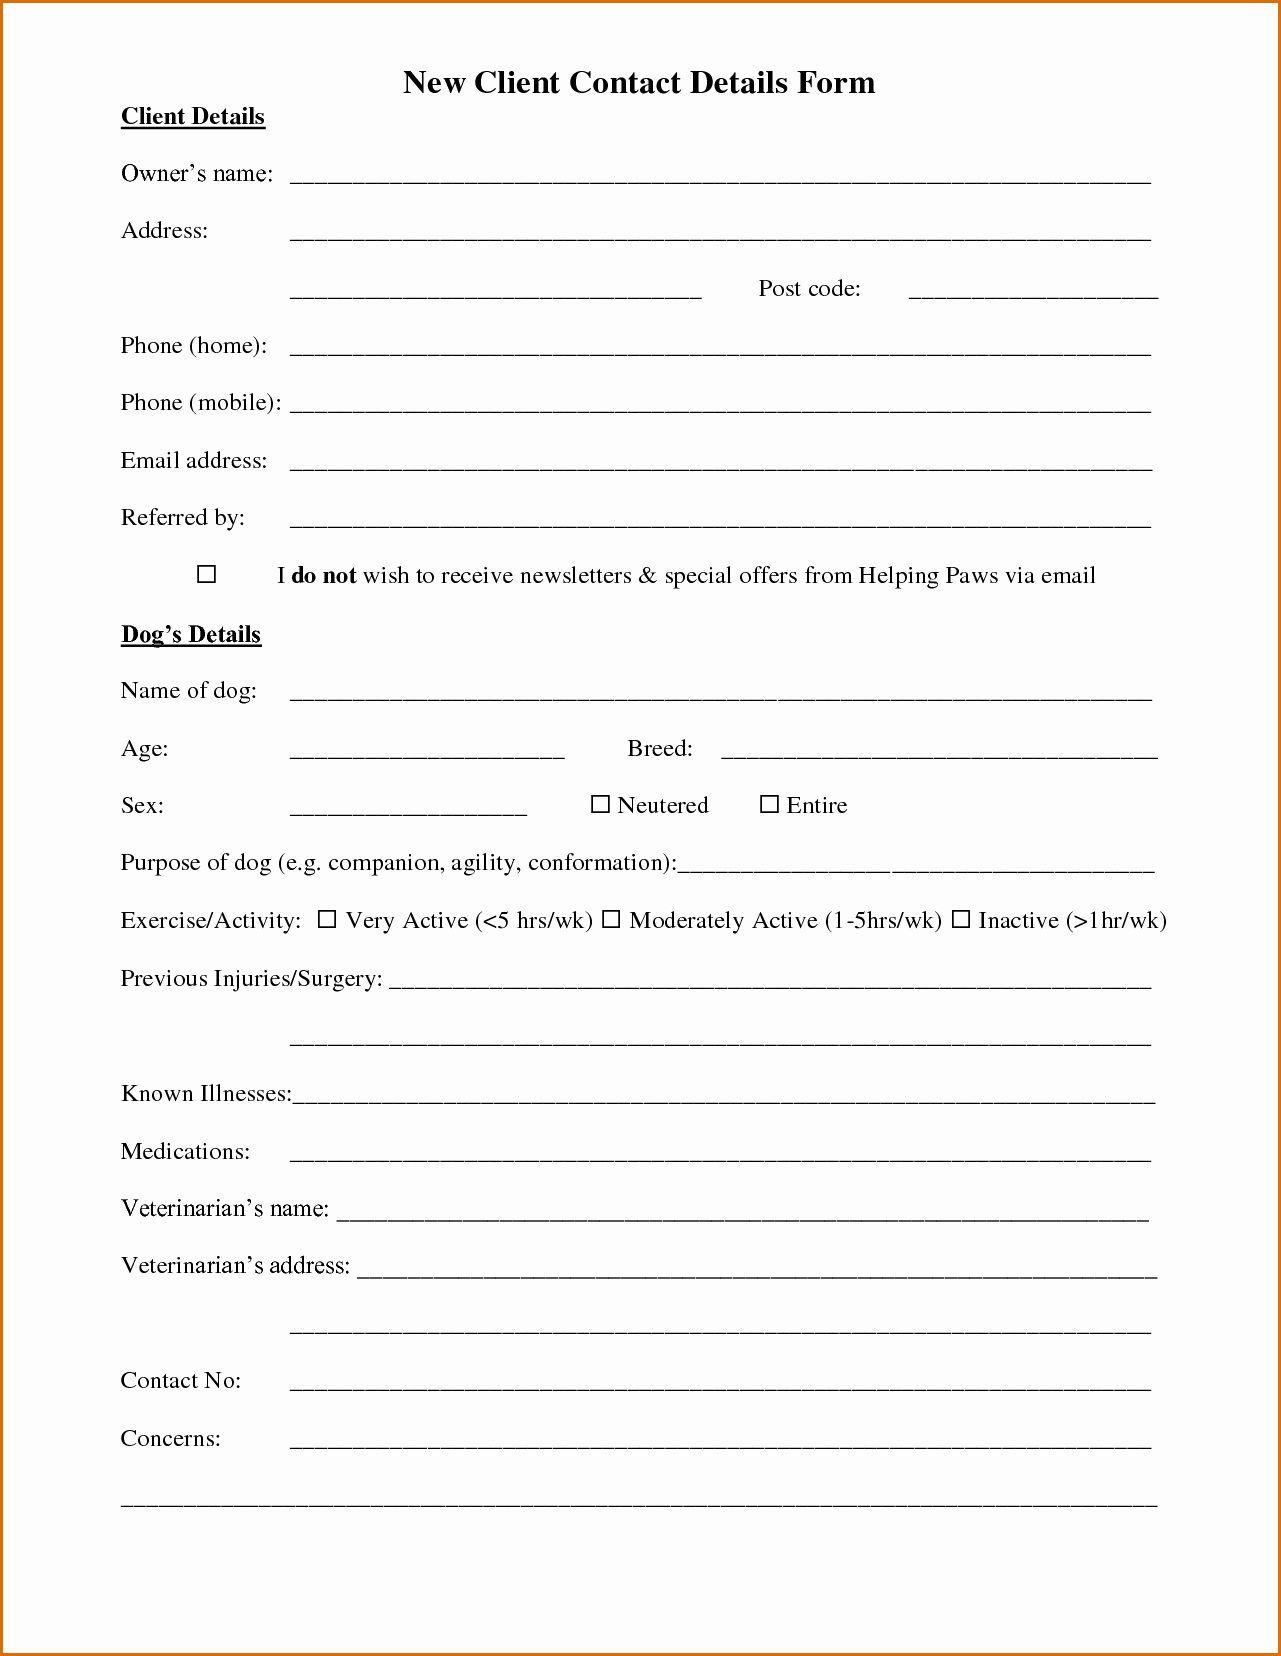 005 Surprising Customer Information Sheet Template High Resolution  New Info Excel SpreadsheetFull